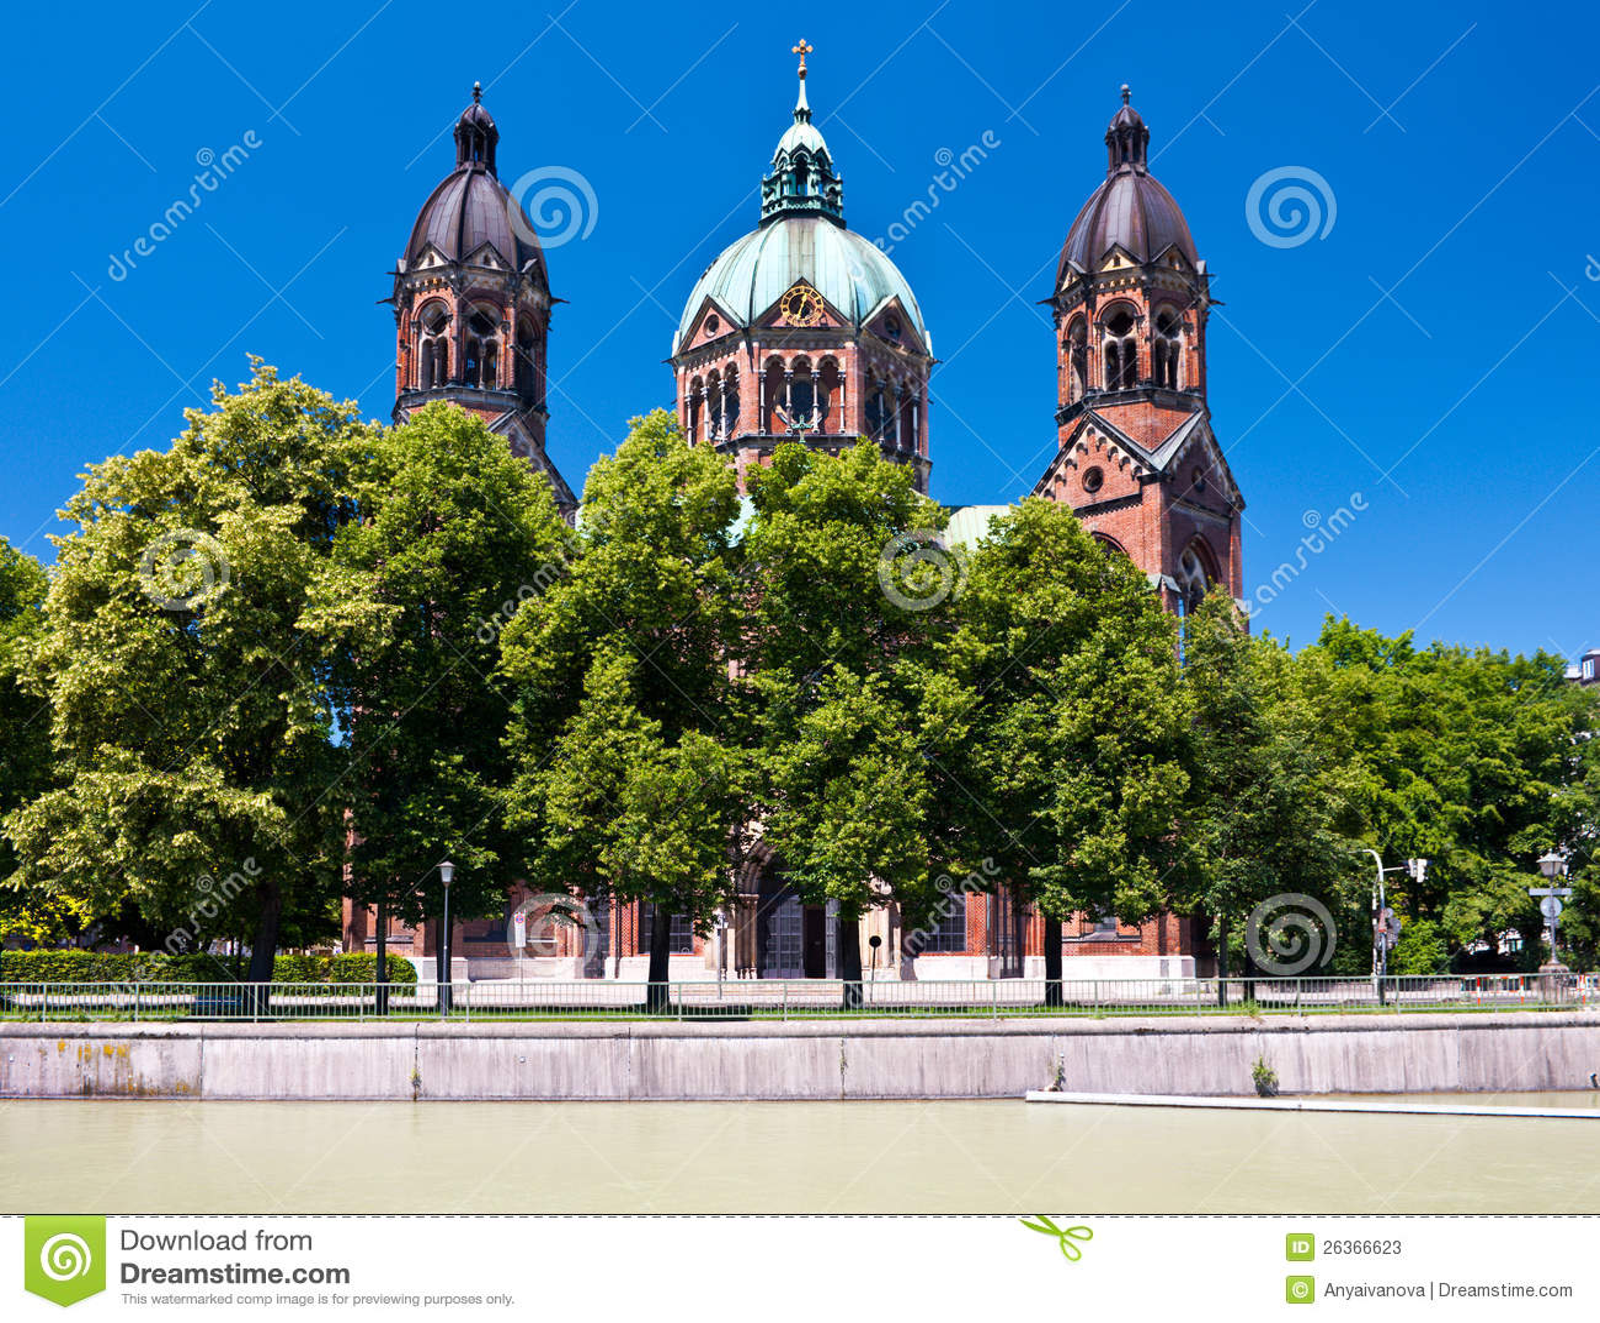 Церковь St. Lukas, Мюнхен, Германия